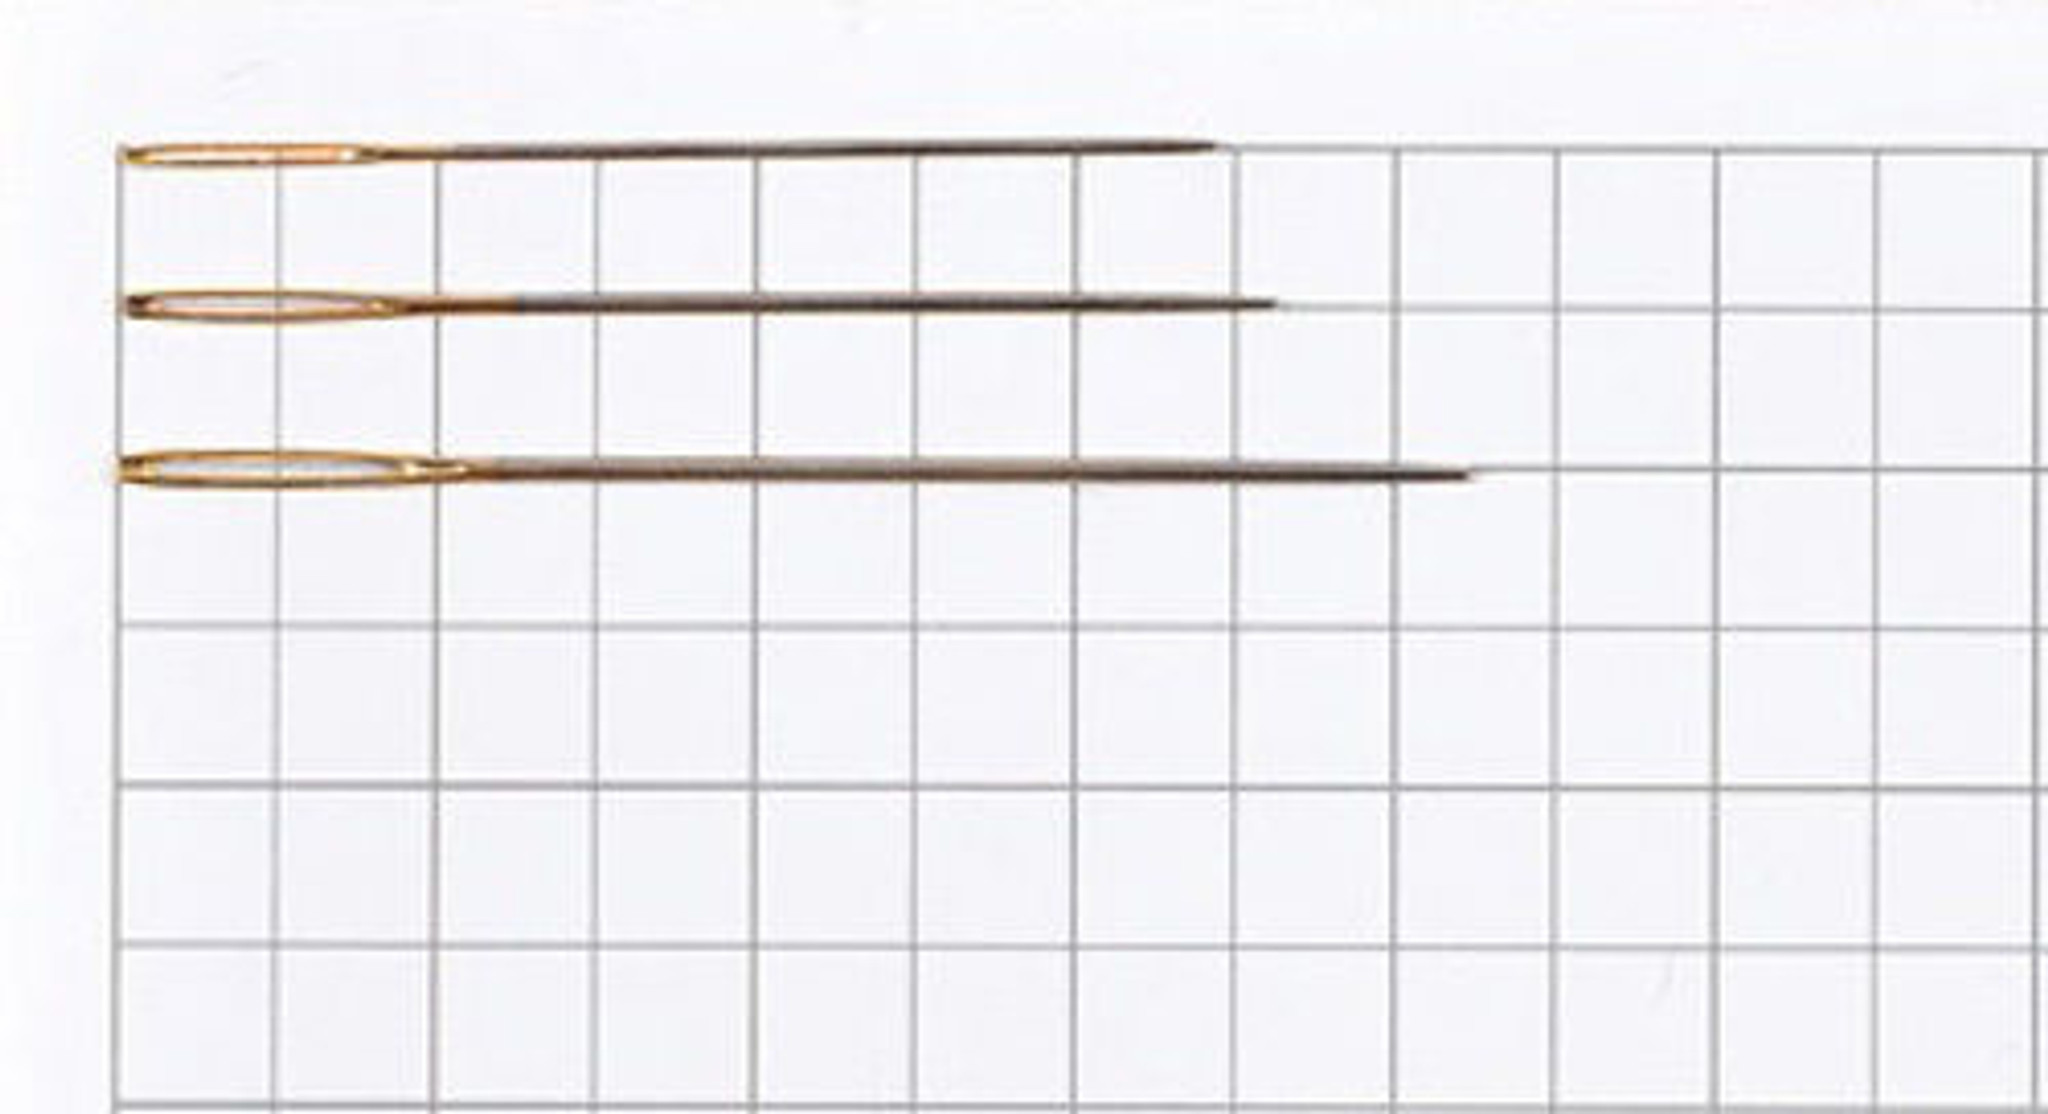 Tulip TBN-004 Beading Needles #12 Long Slightly 2 pcs // 0.35 x 47.5mm